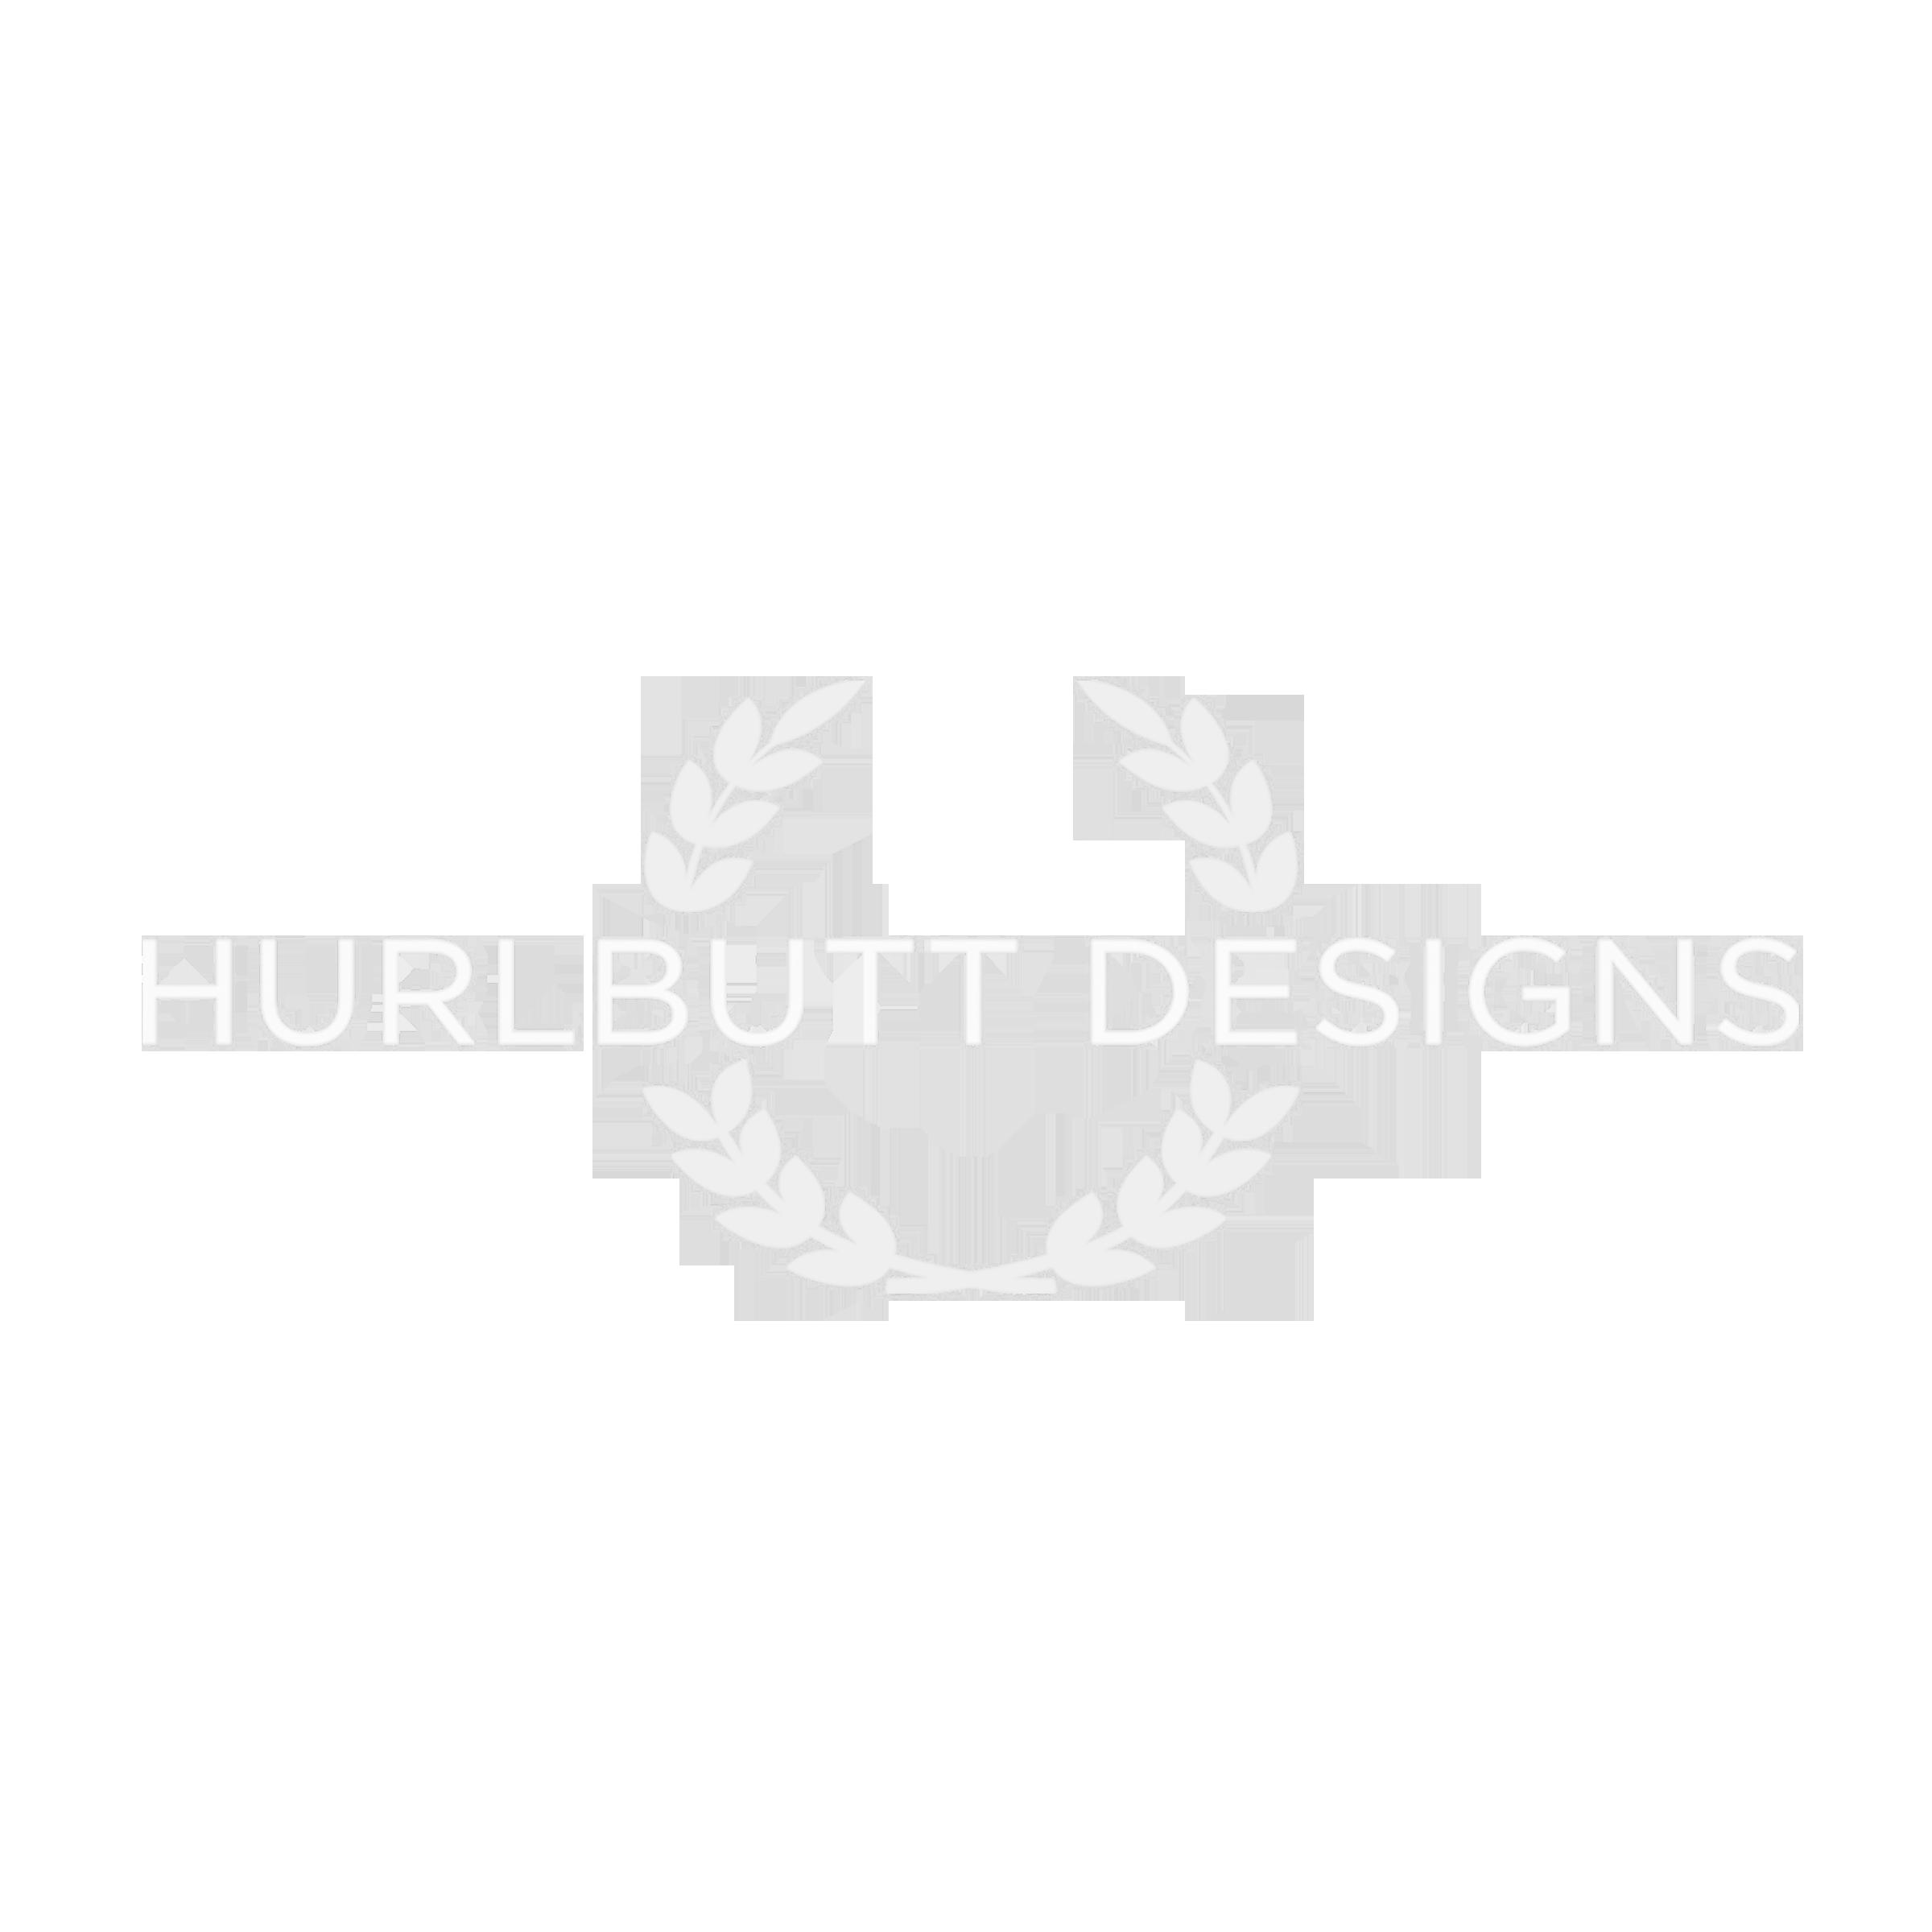 Hurlbutt Designs